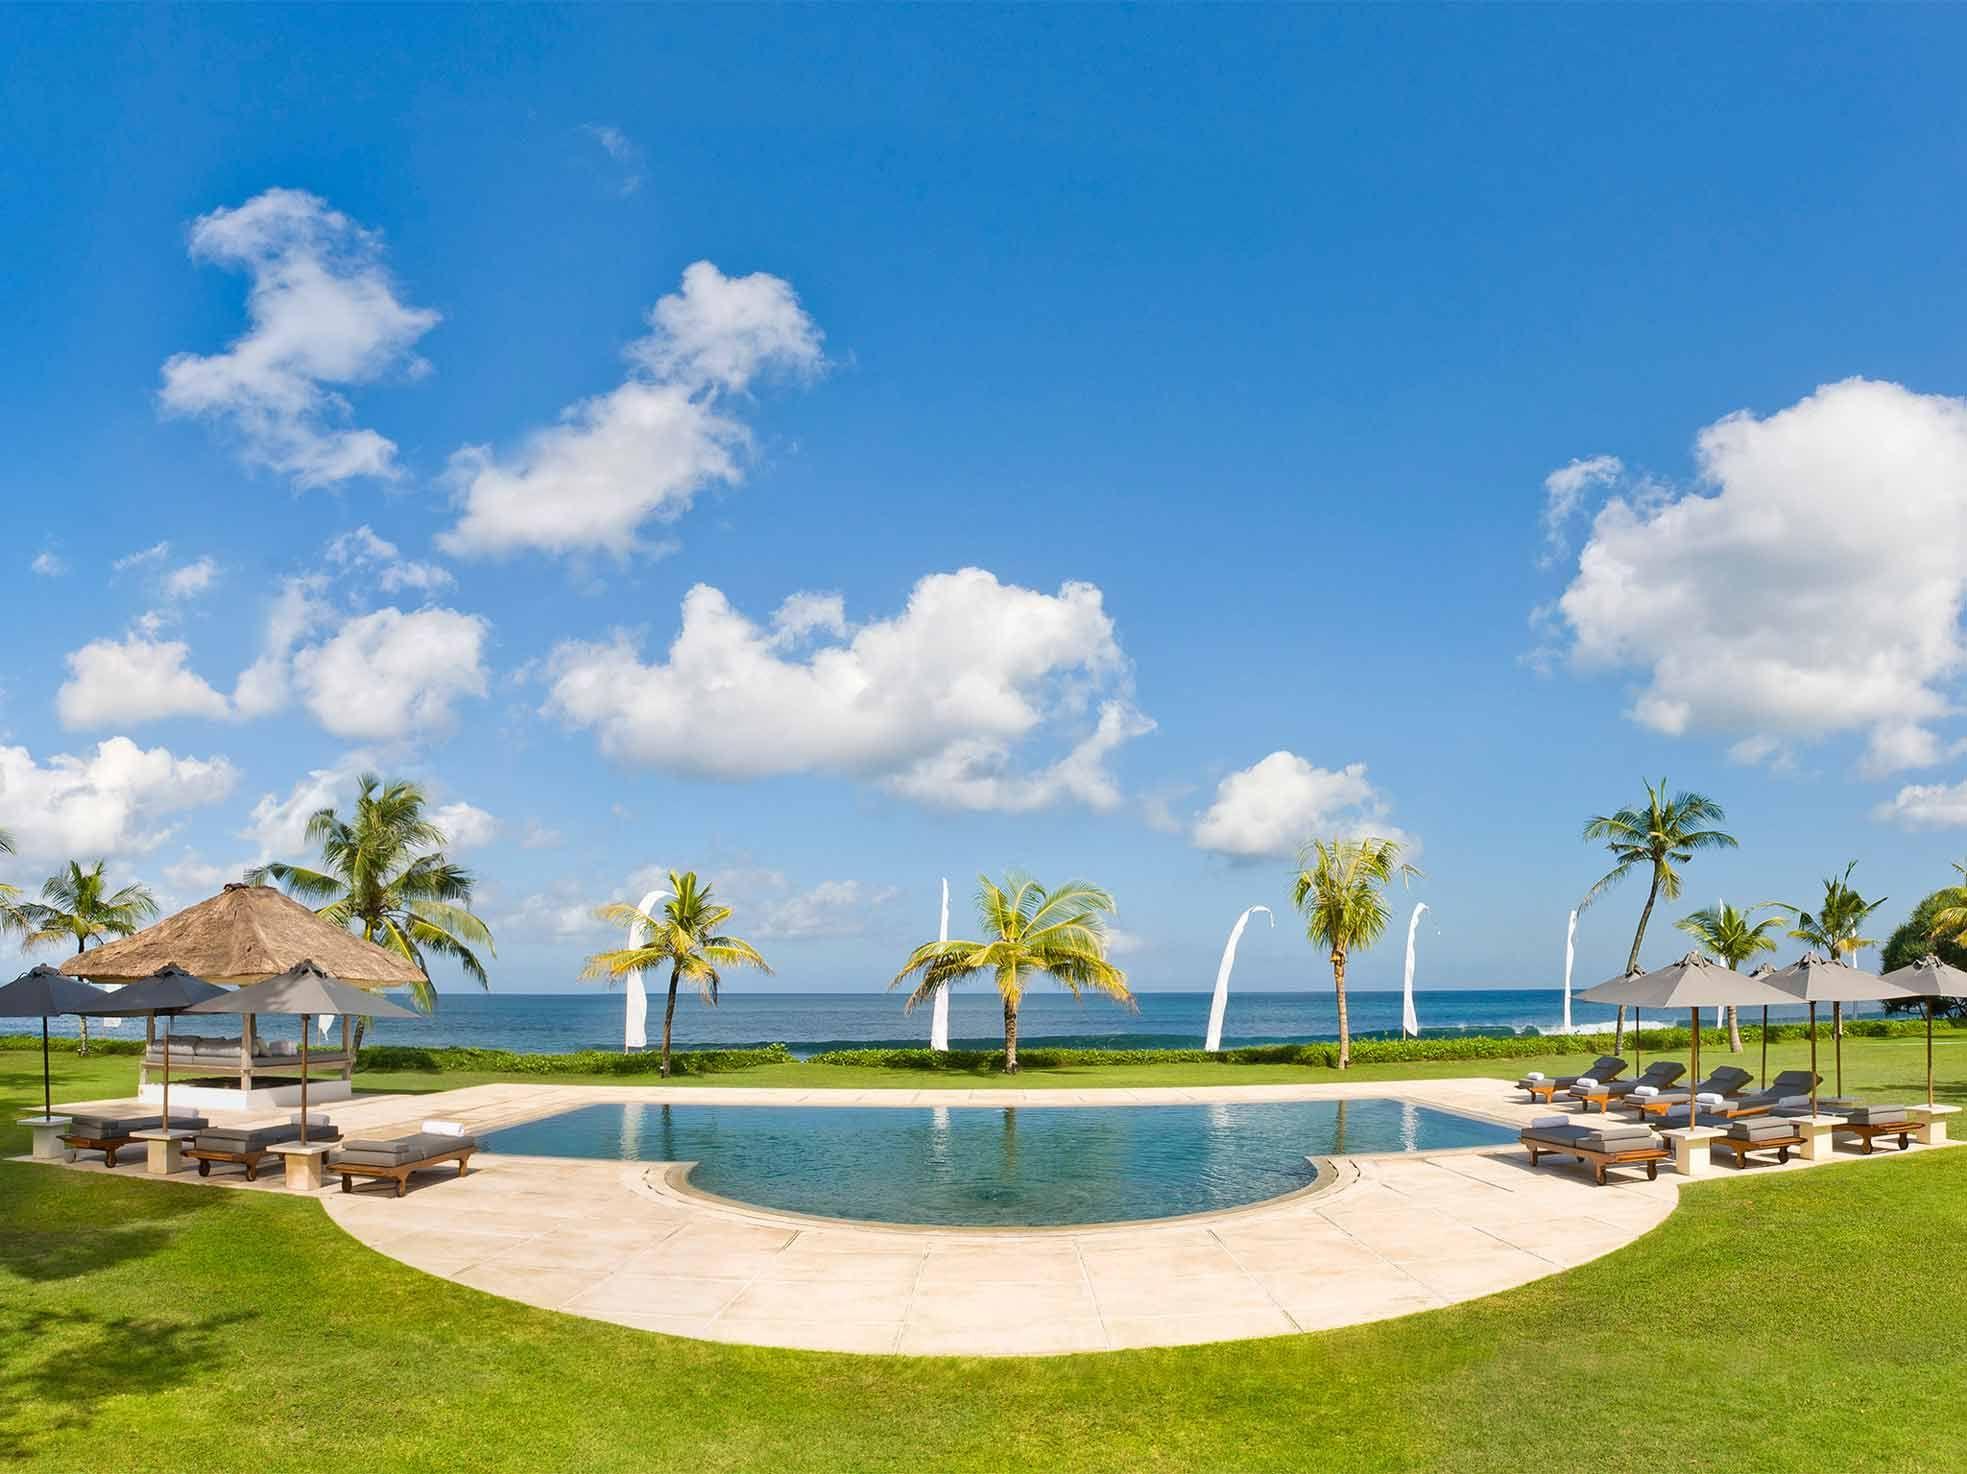 Bali wedding venues on the beach  Villa Atas Ombak is a magnificent  bedroom villa with a superb